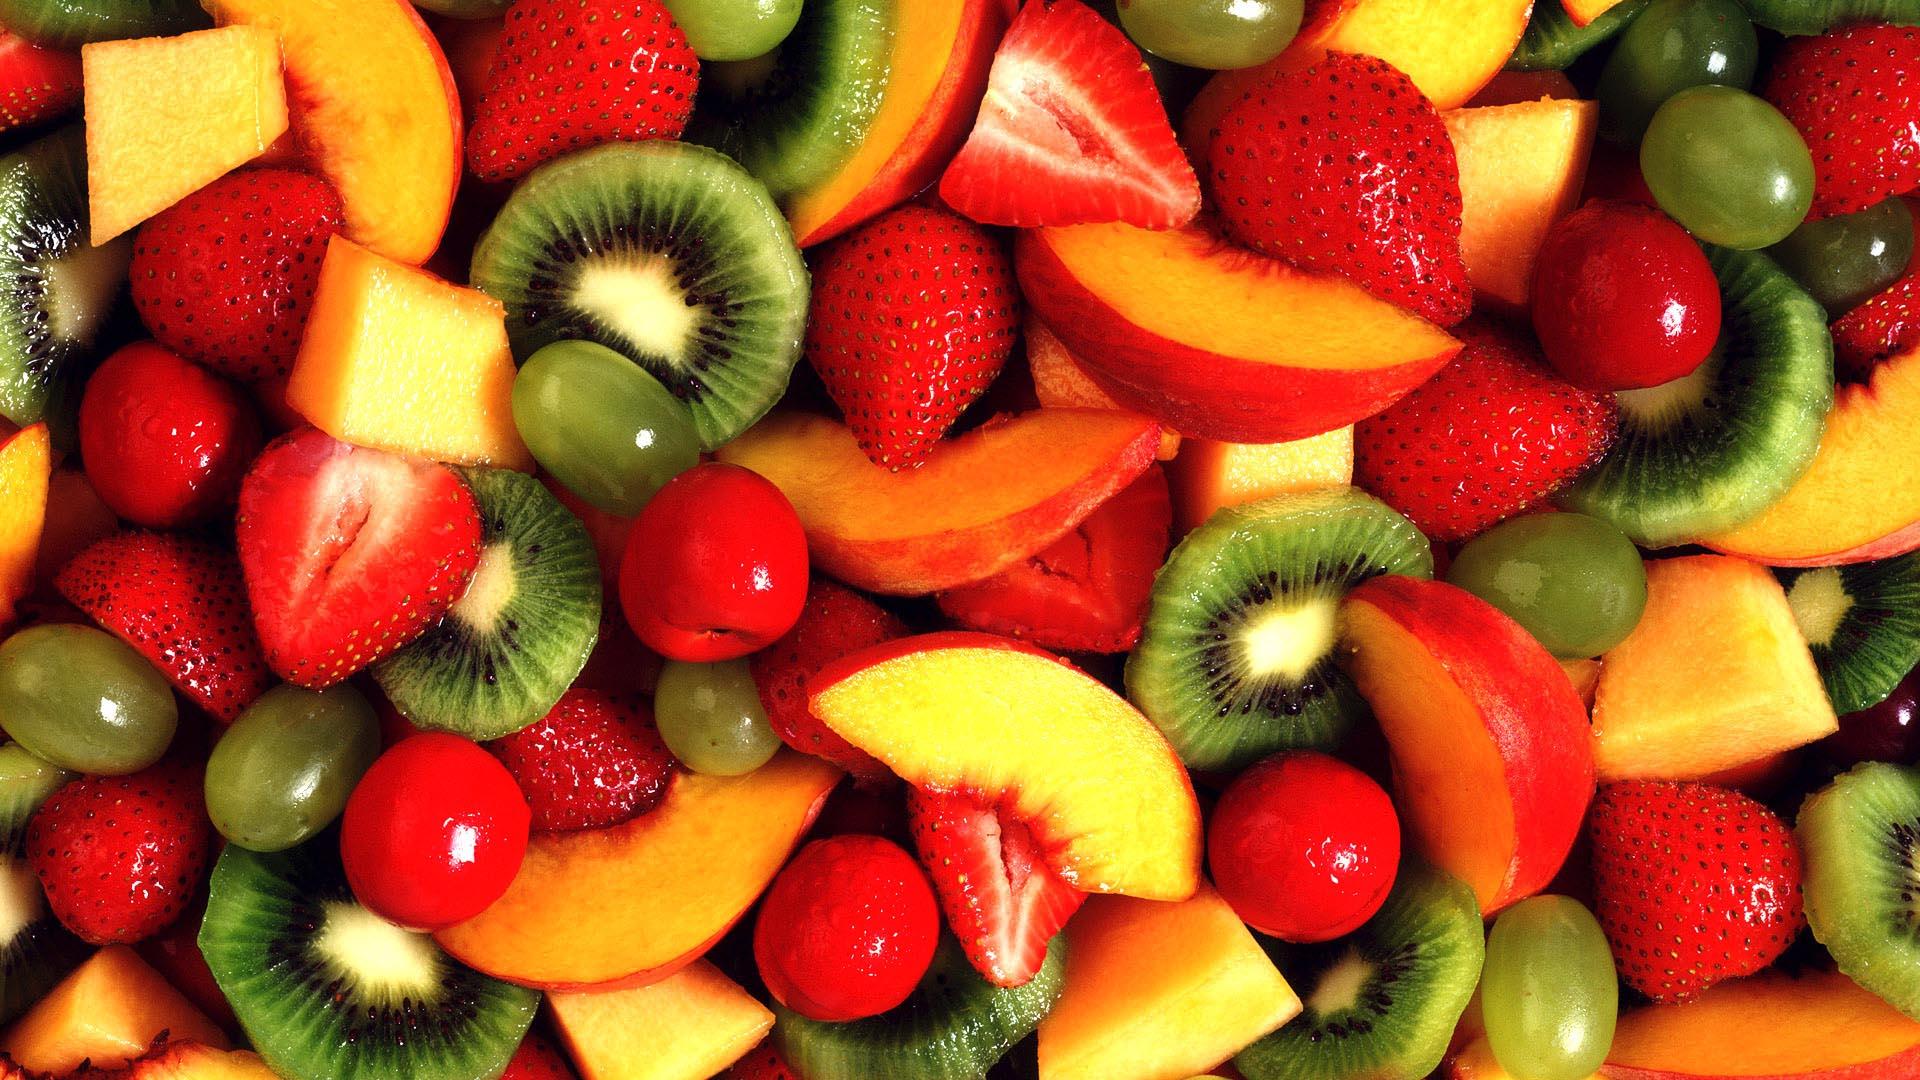 Fresh Fruit HD Wallpaper FullHDWpp   Full HD Wallpapers 1920x1080 1920x1080